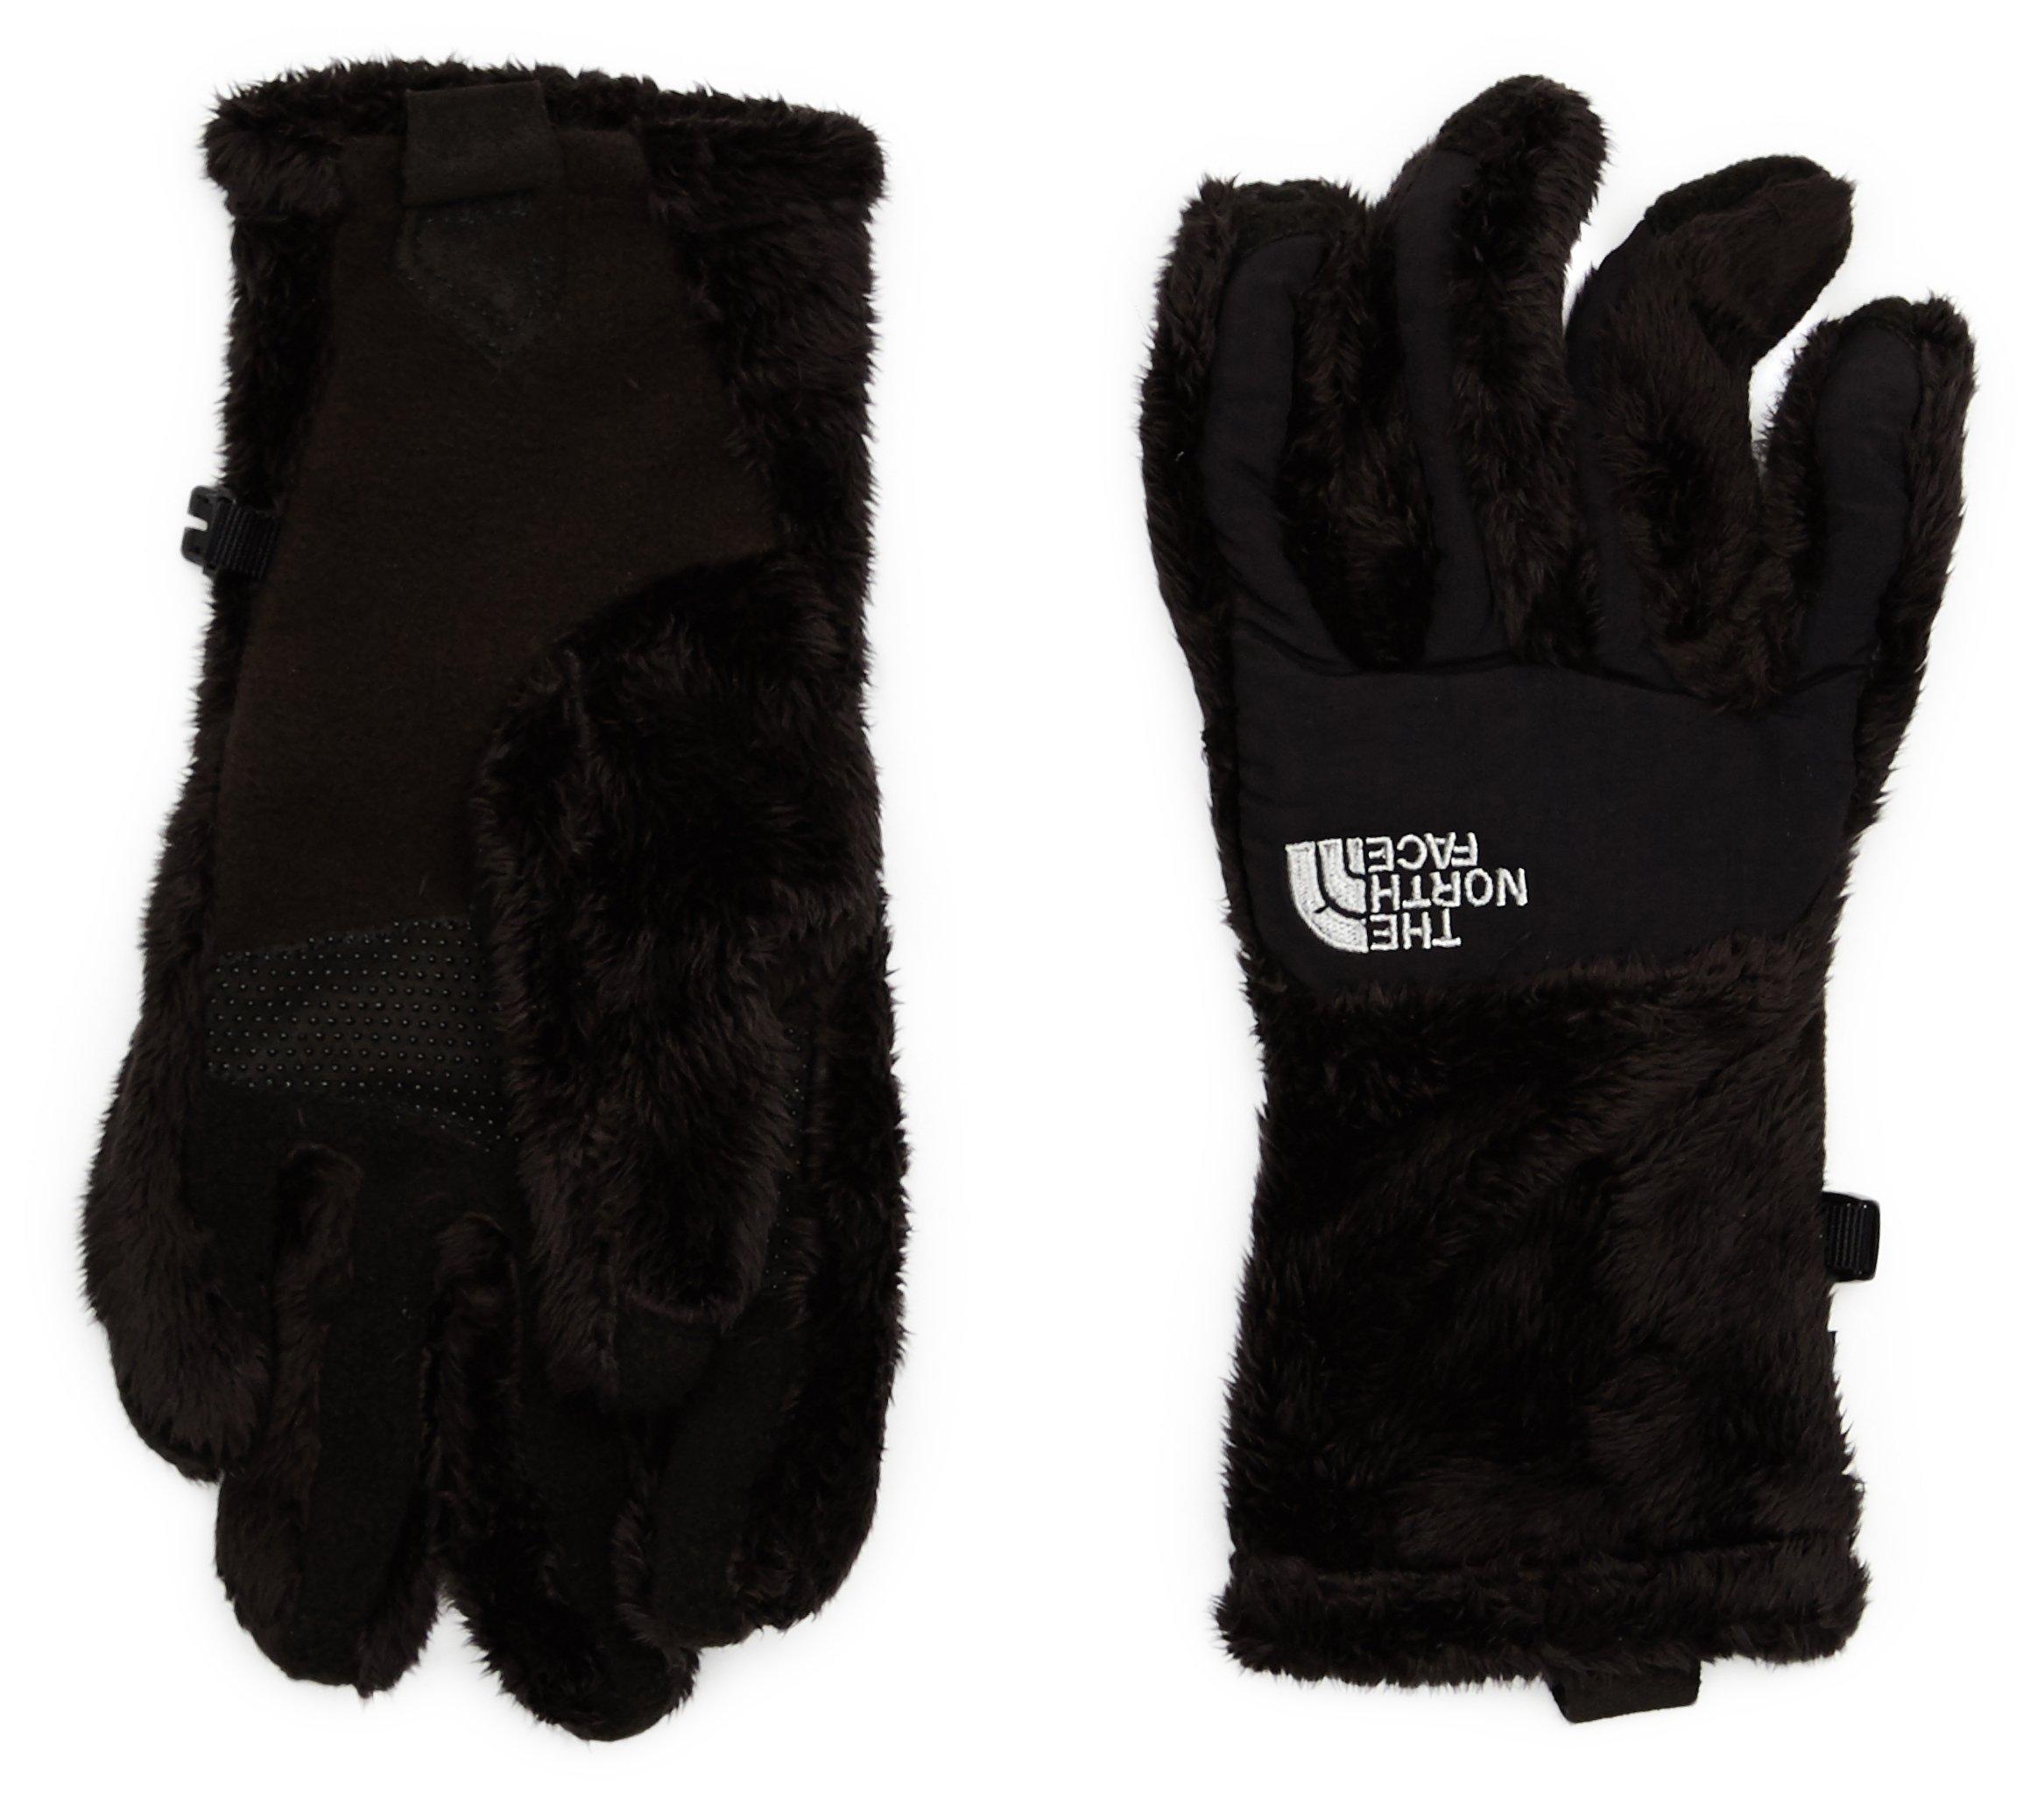 The North Face Women's Women's Denali Thermal Etip Glove TNF Black MD